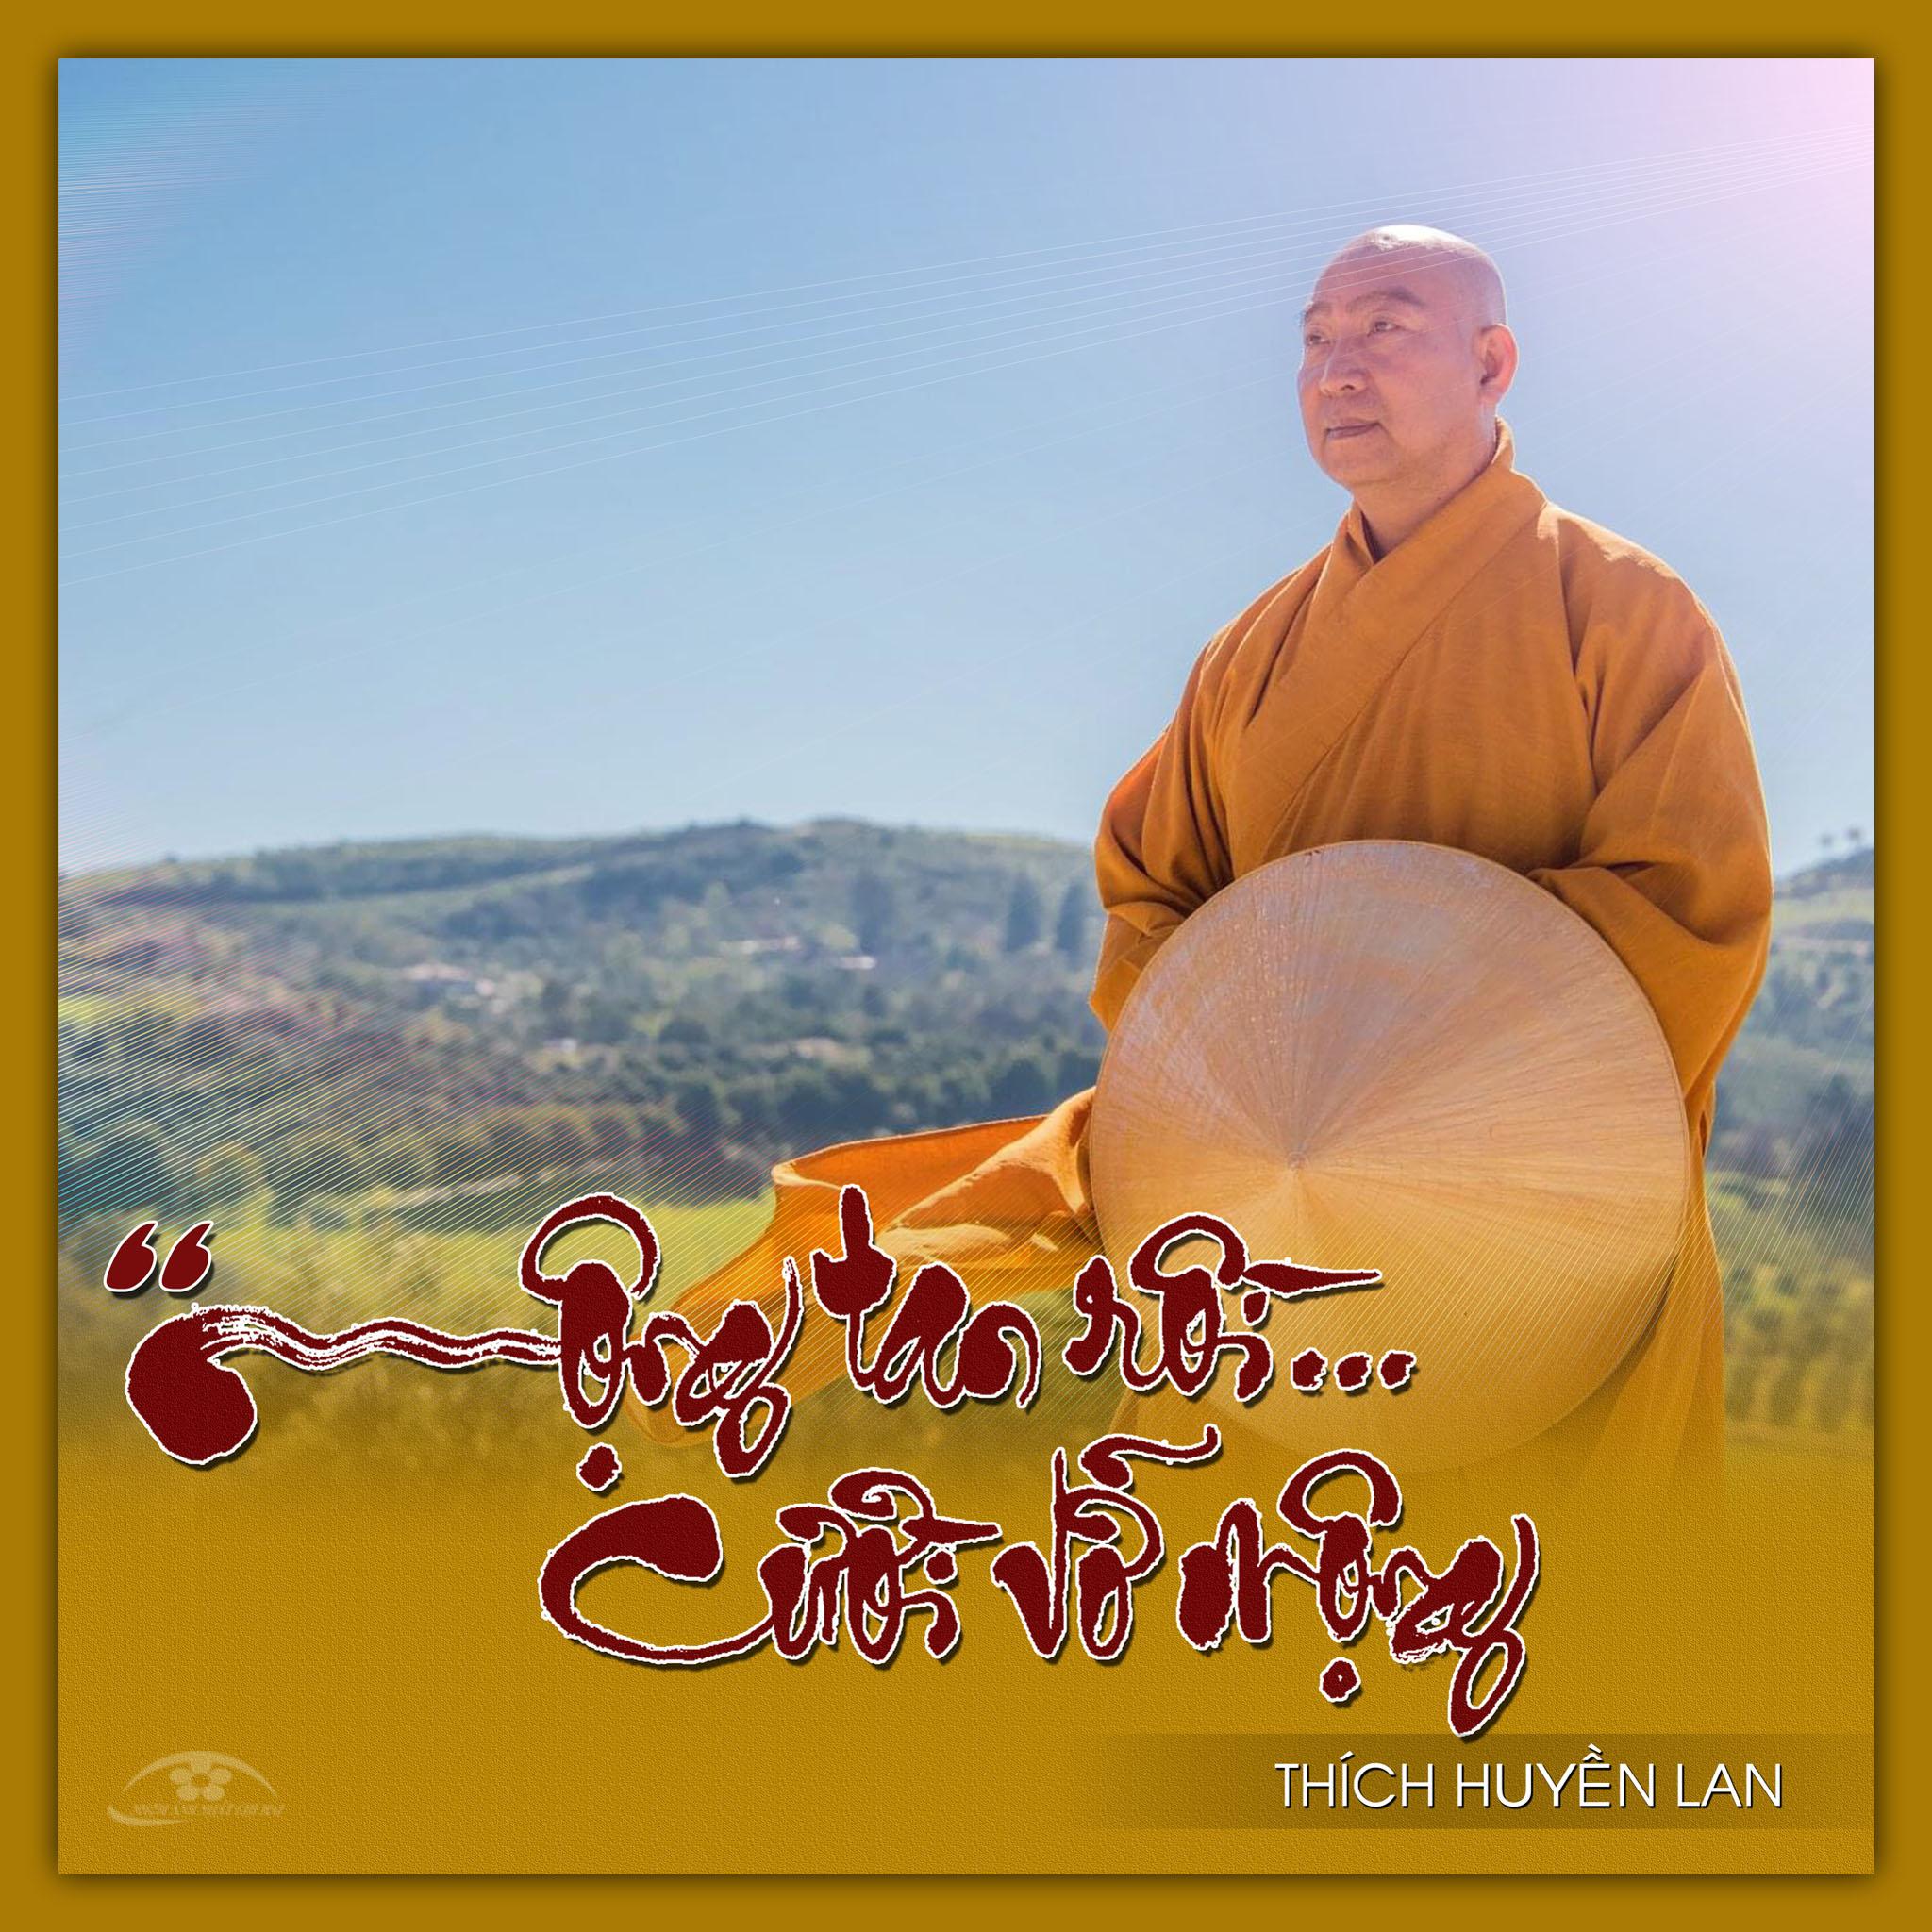 mong_tan_roi_cuoi_vo_mong_thich_huyen_lan.jpg